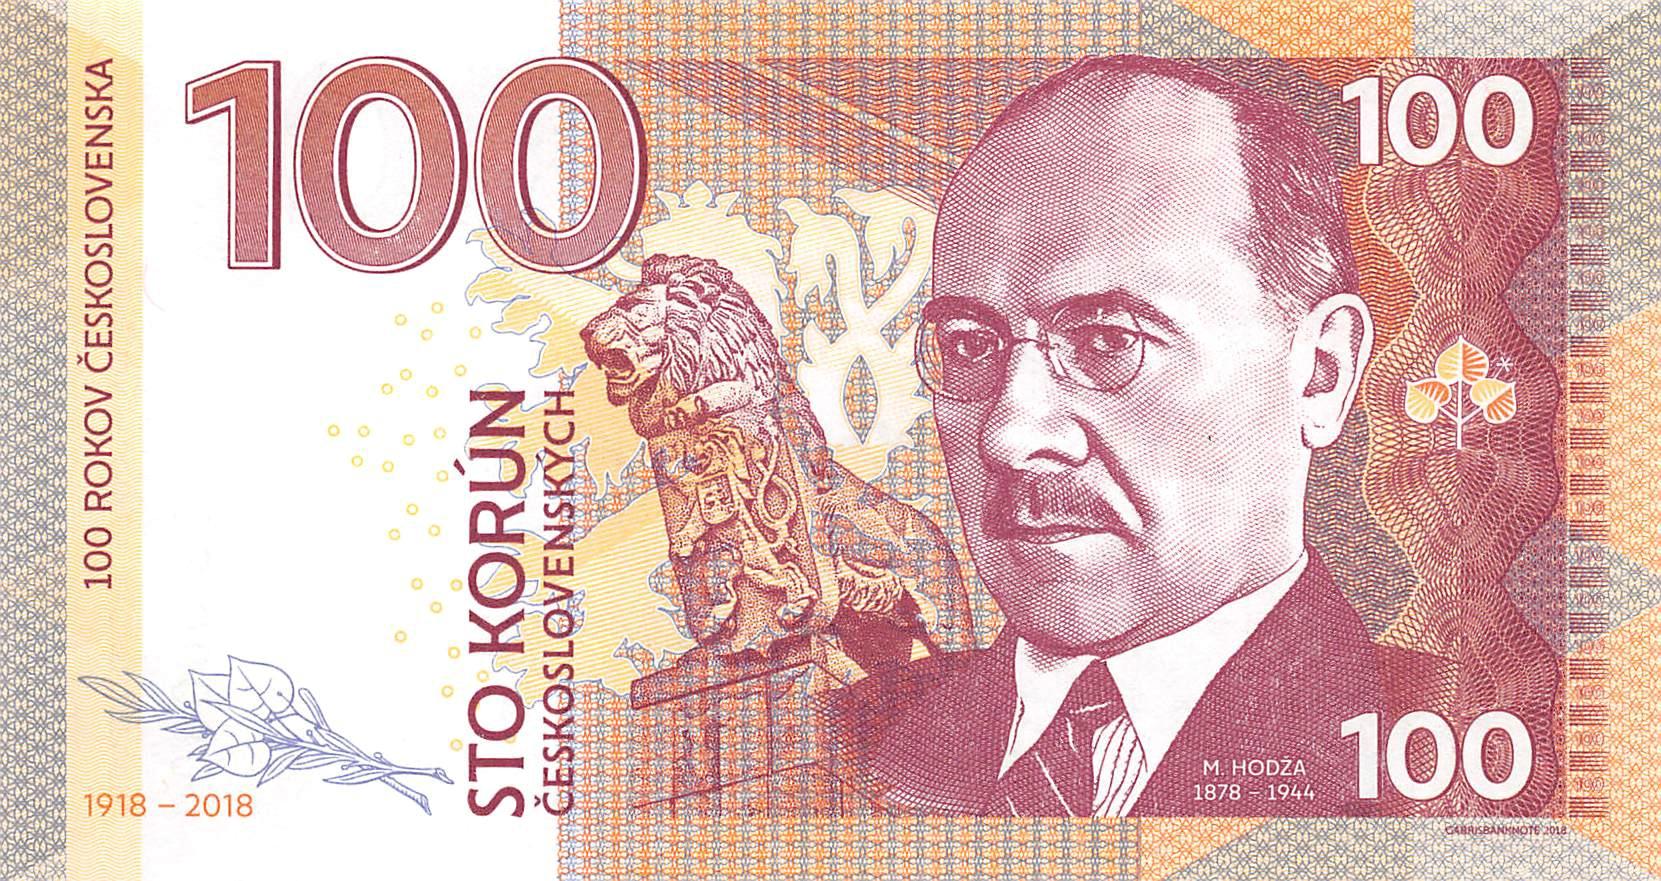 2018 100 Korun Private issue UNC /> Milan Hodža Specimen Czechoslovakia